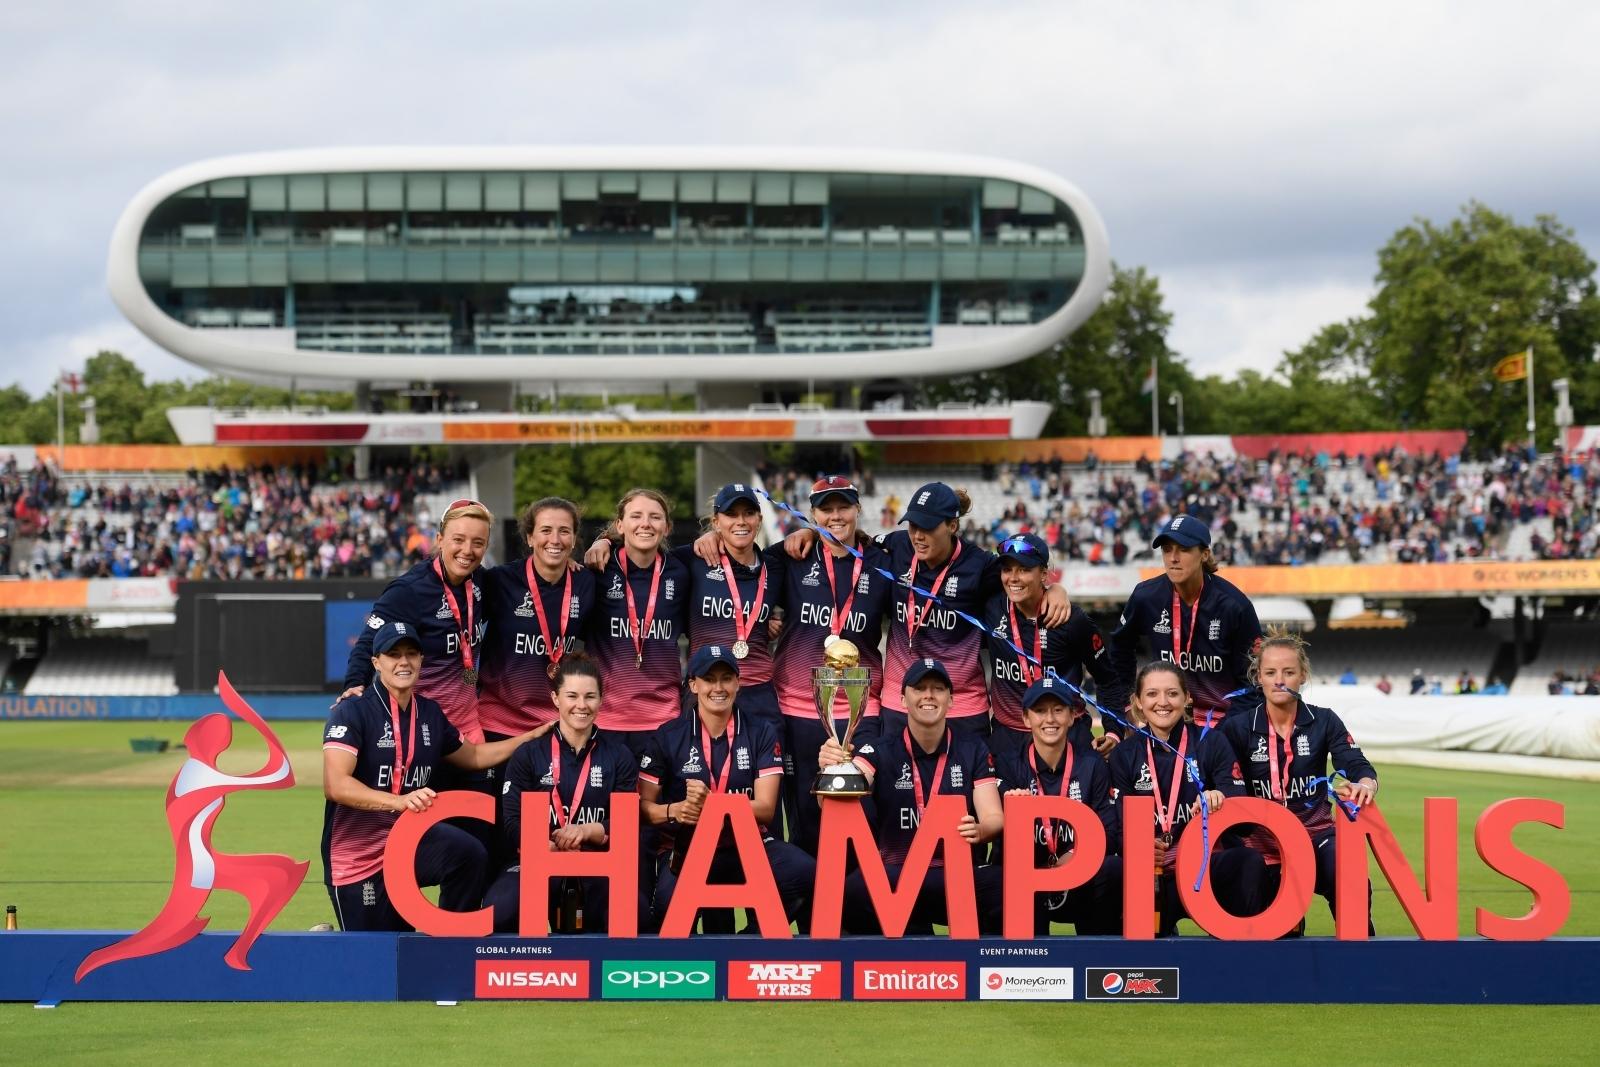 England Women's Cricket Team